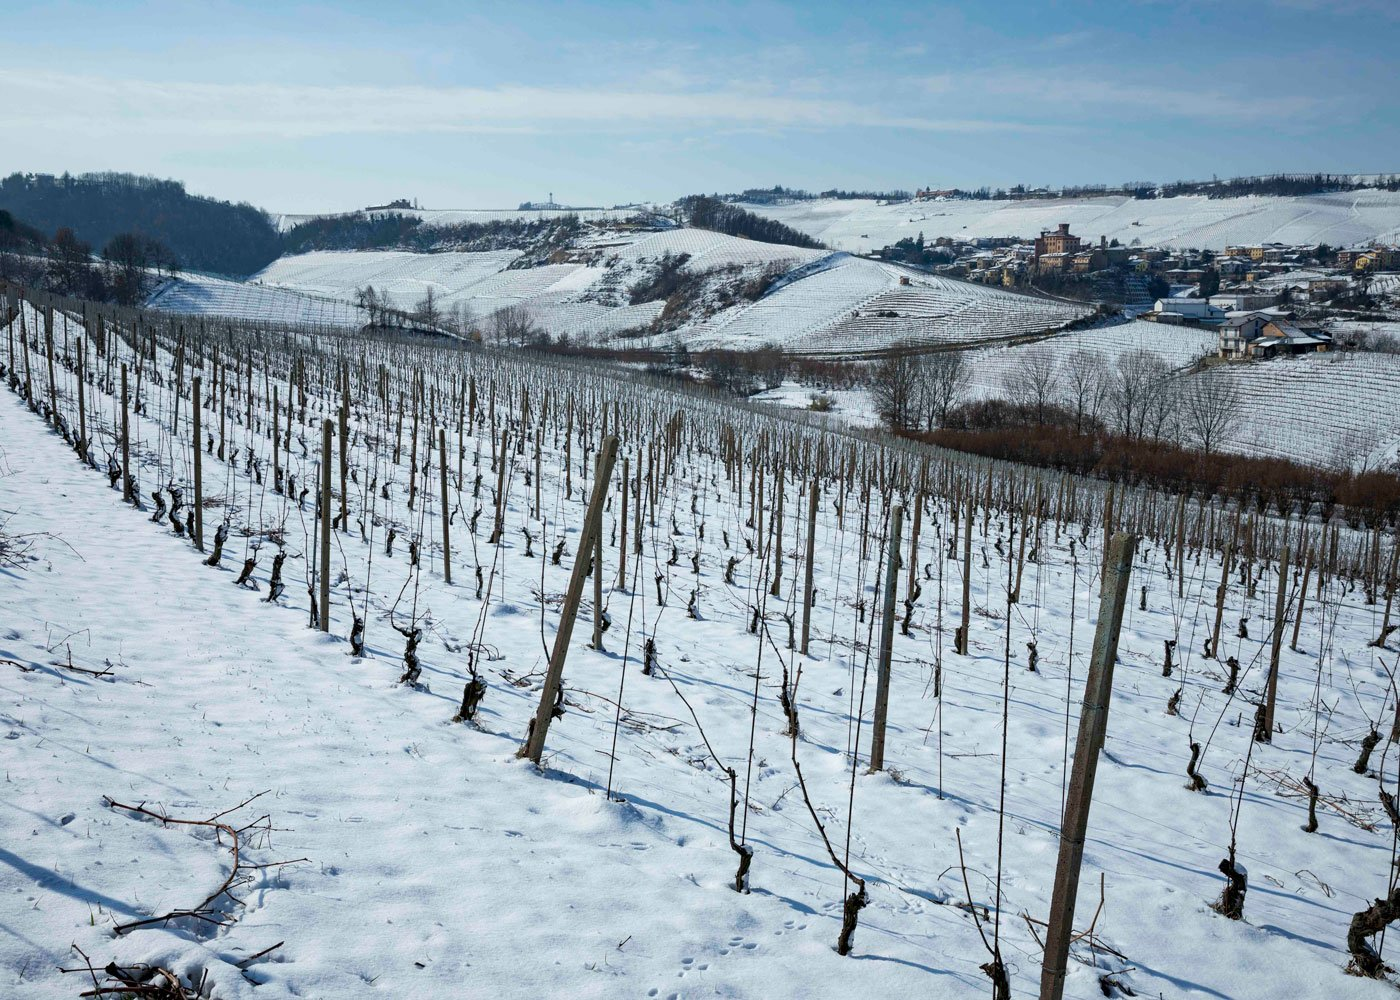 The Nebbiolo vineyards in winter: Vignane